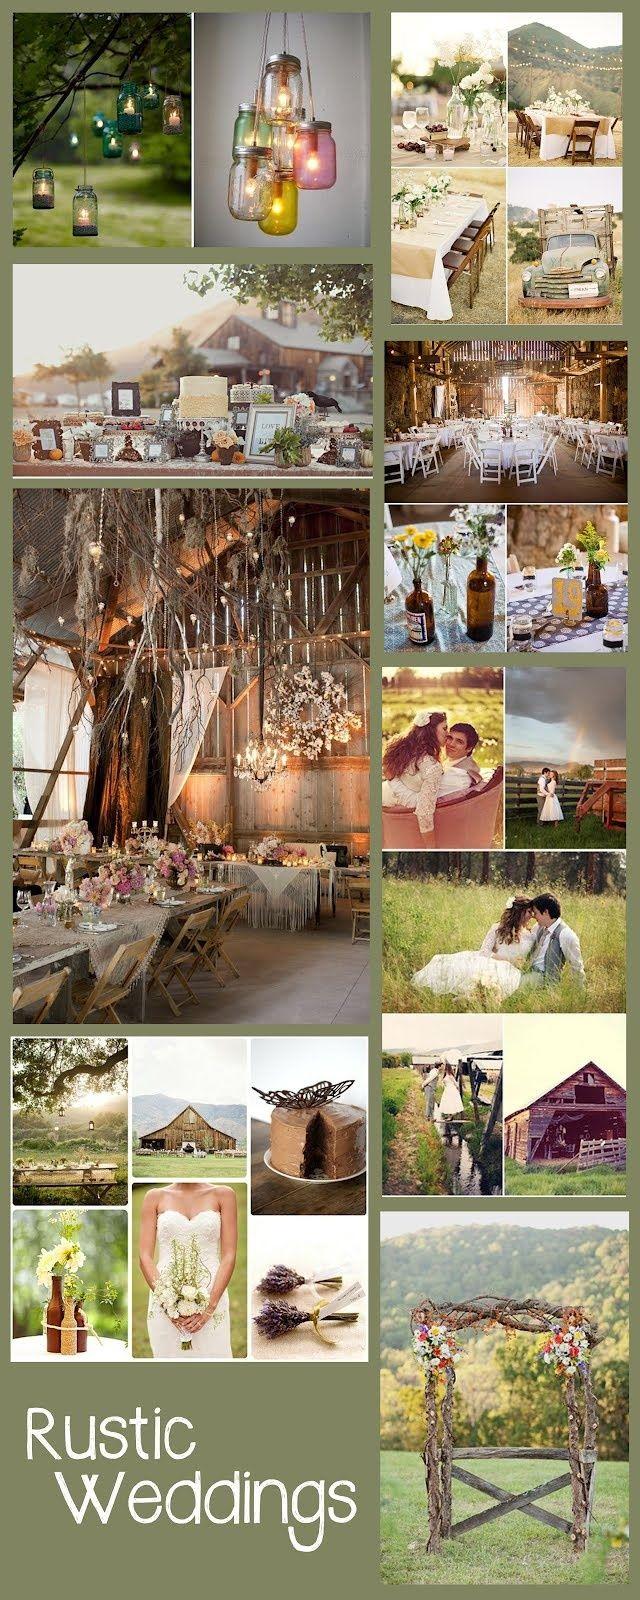 Diy camo wedding decorations  Pin by Laura Mcnicoll on Wedding Ideas  Pinterest  Wedding